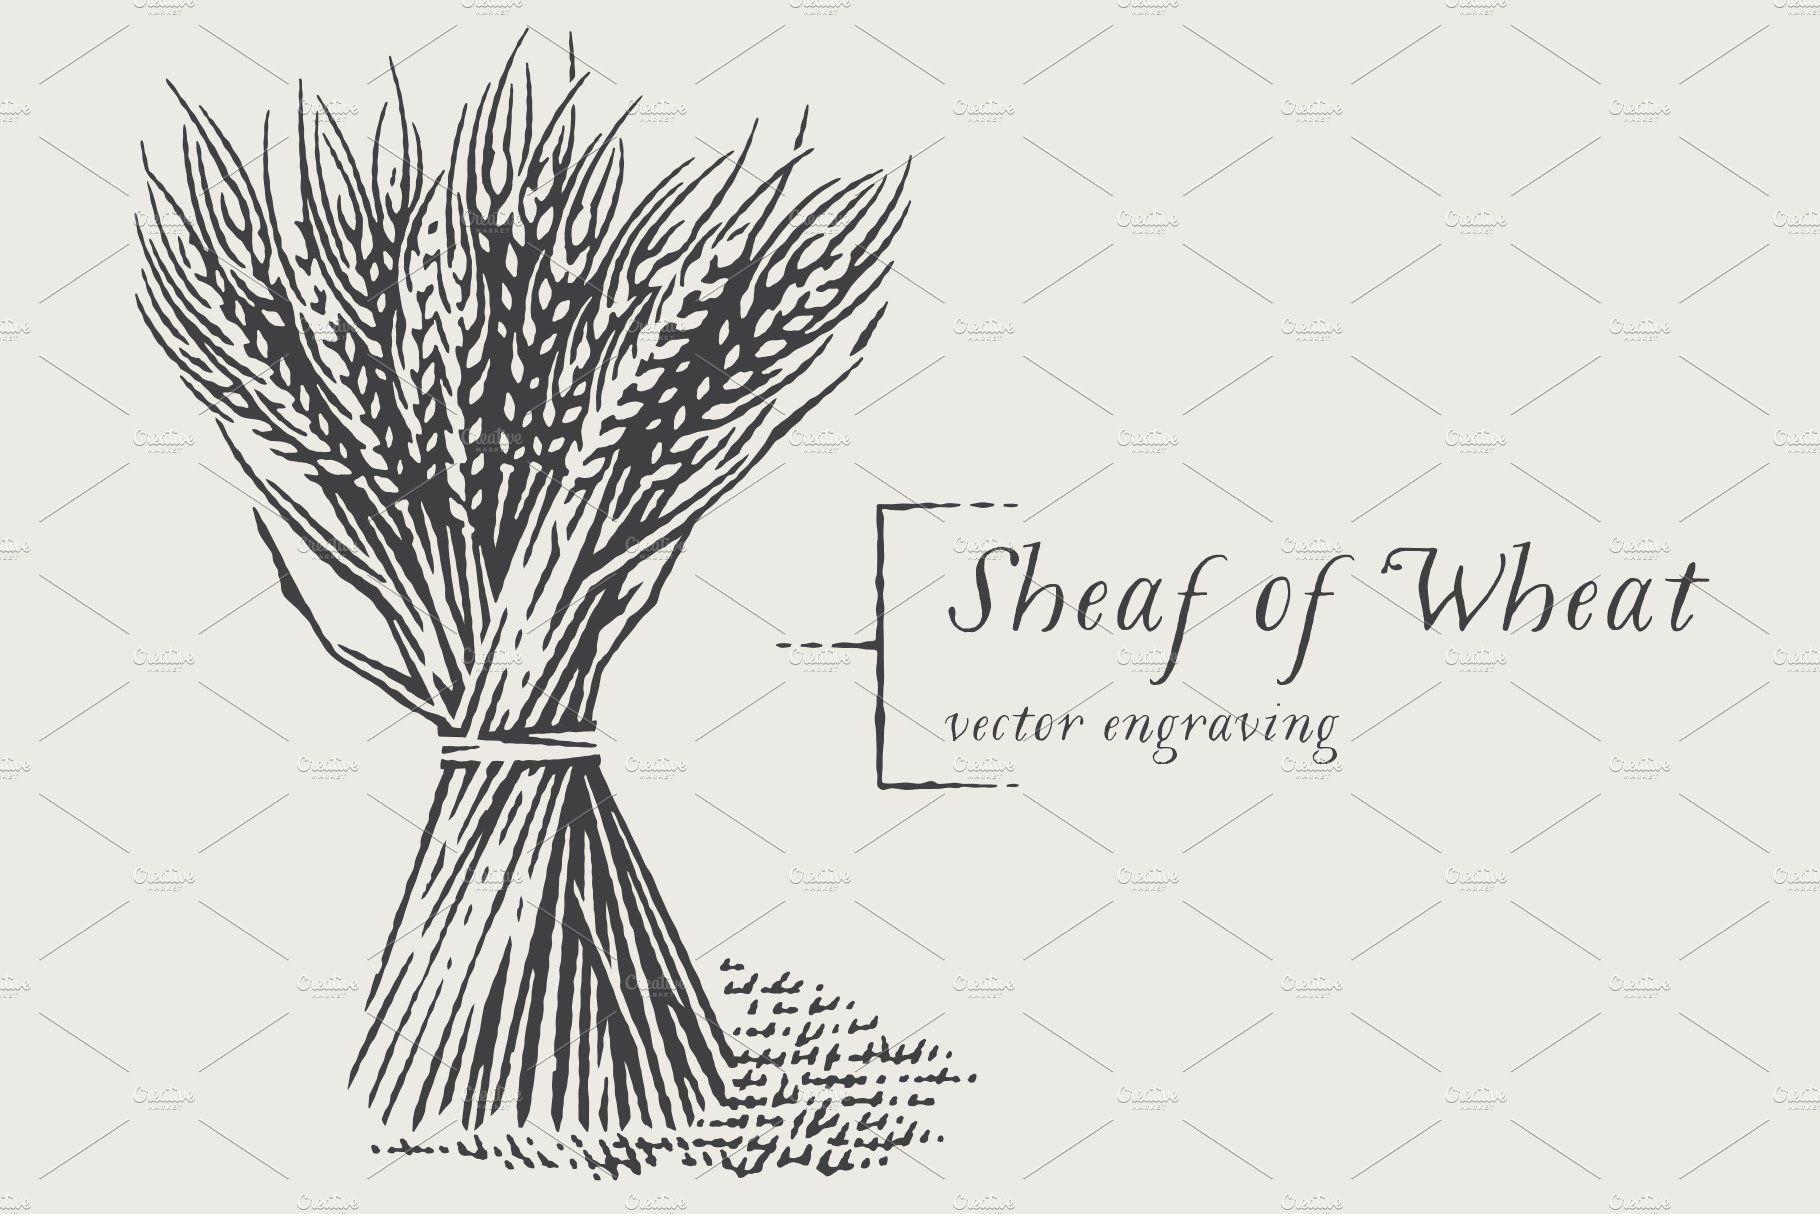 Wheat Sheaf Stock Illustrations – 2,126 Wheat Sheaf Stock Illustrations,  Vectors & Clipart - Dreamstime